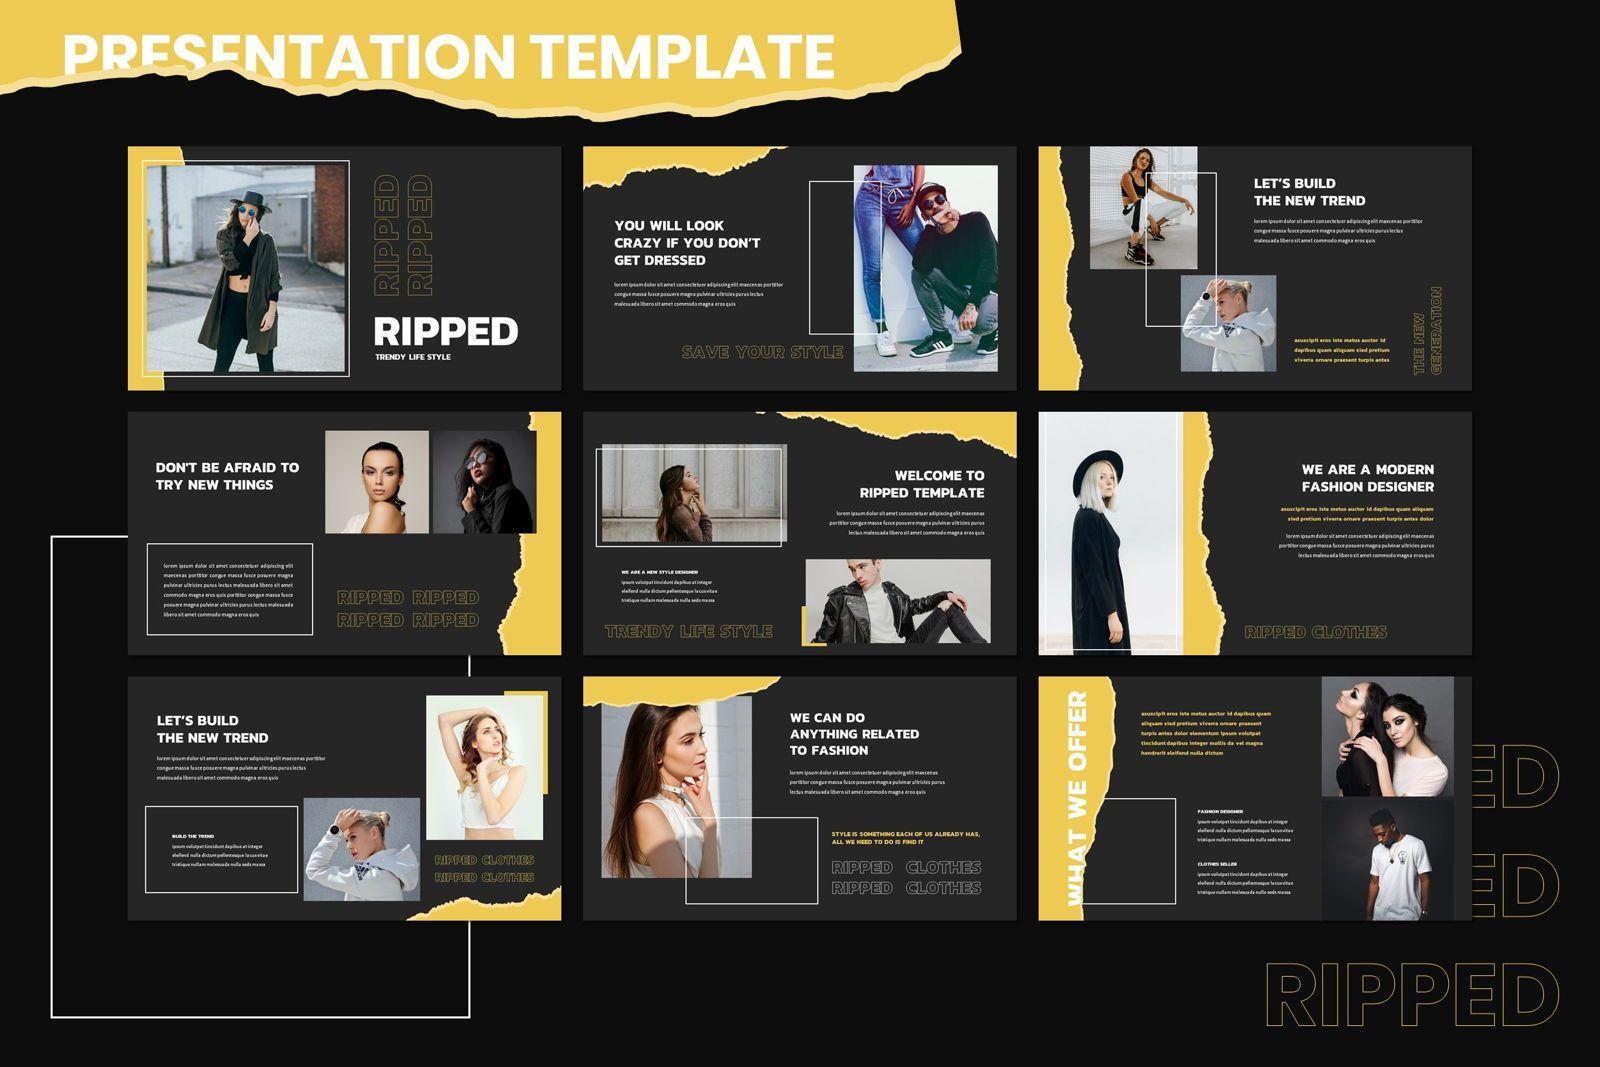 Riped - Google Slides Template, Slide 2, 08011, Presentation Templates — PoweredTemplate.com